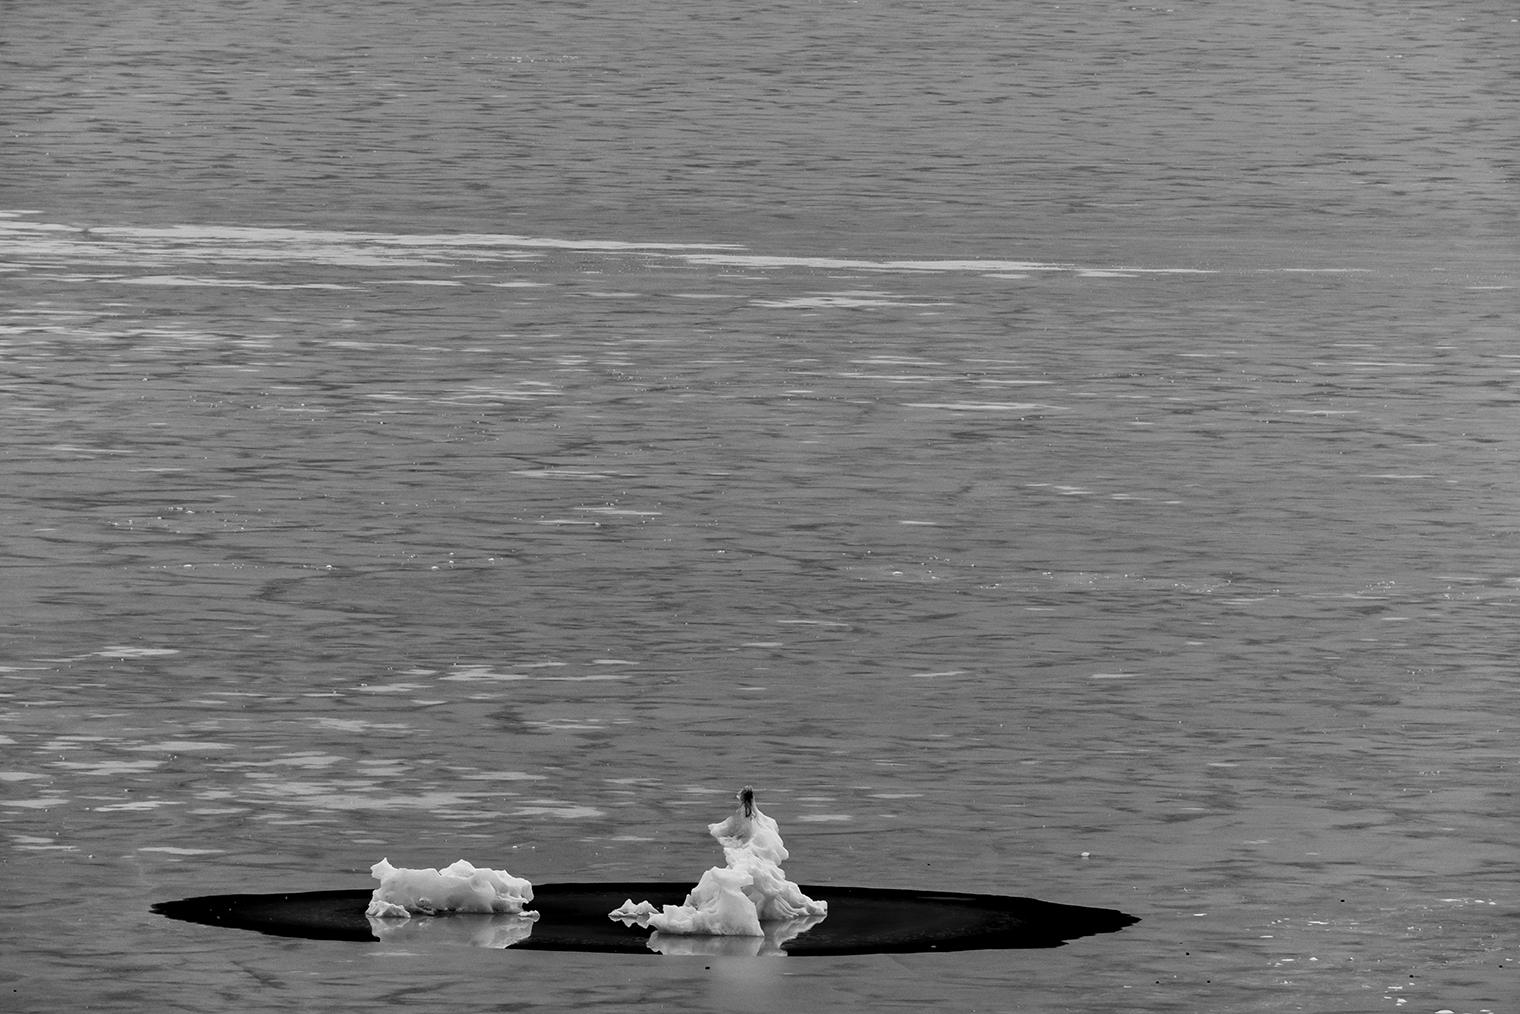 Mendenhall Lake, Alaska, USAImage No: 14-024833-BW  Click HERE to Add to Cart